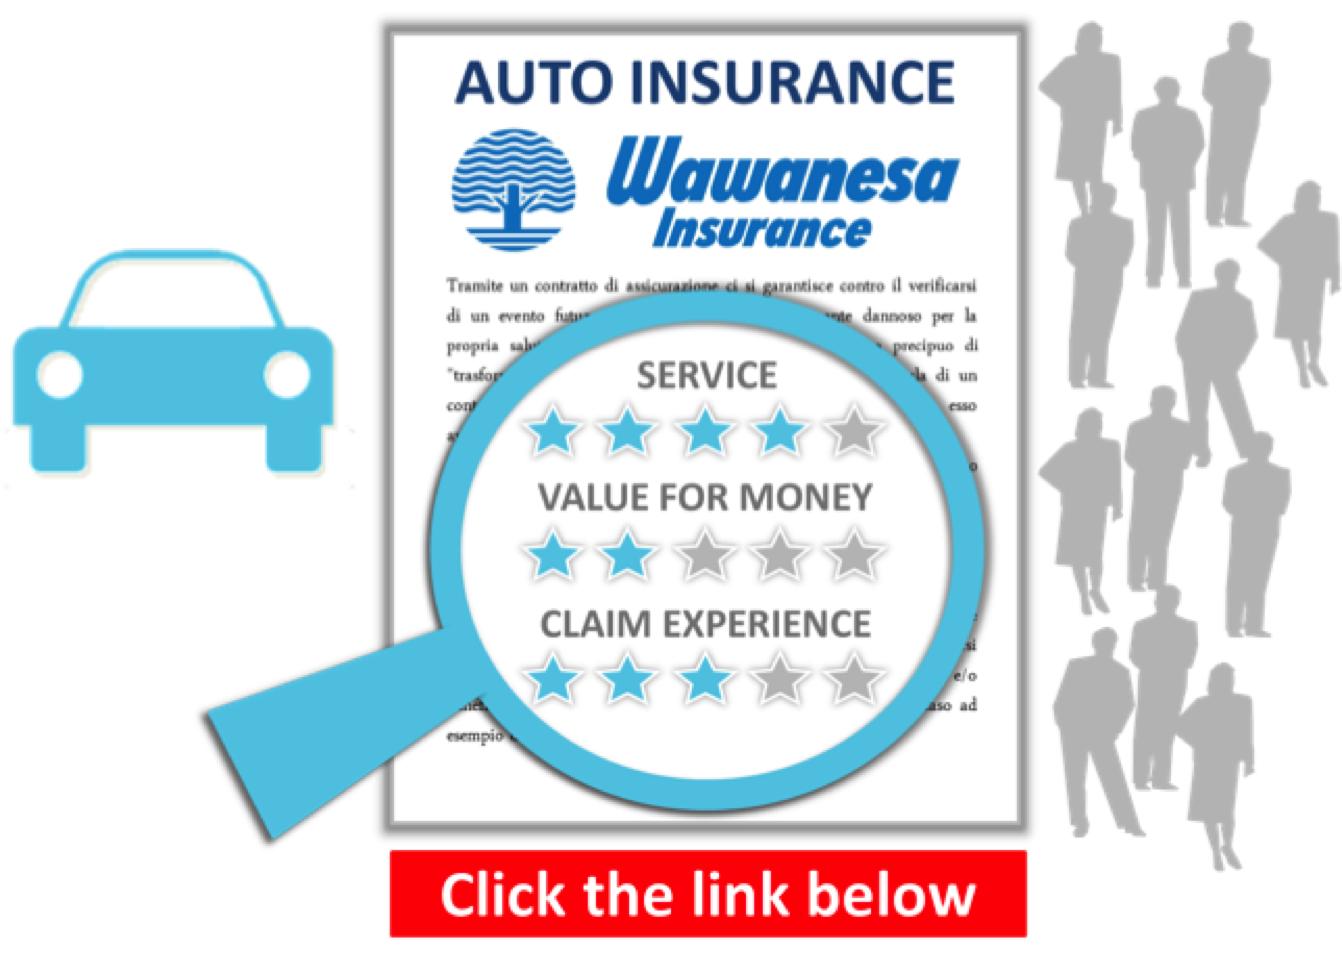 Wawanesa Insurance Quote Independent Consumer Reviews For Wawanesa Insurance  Auto